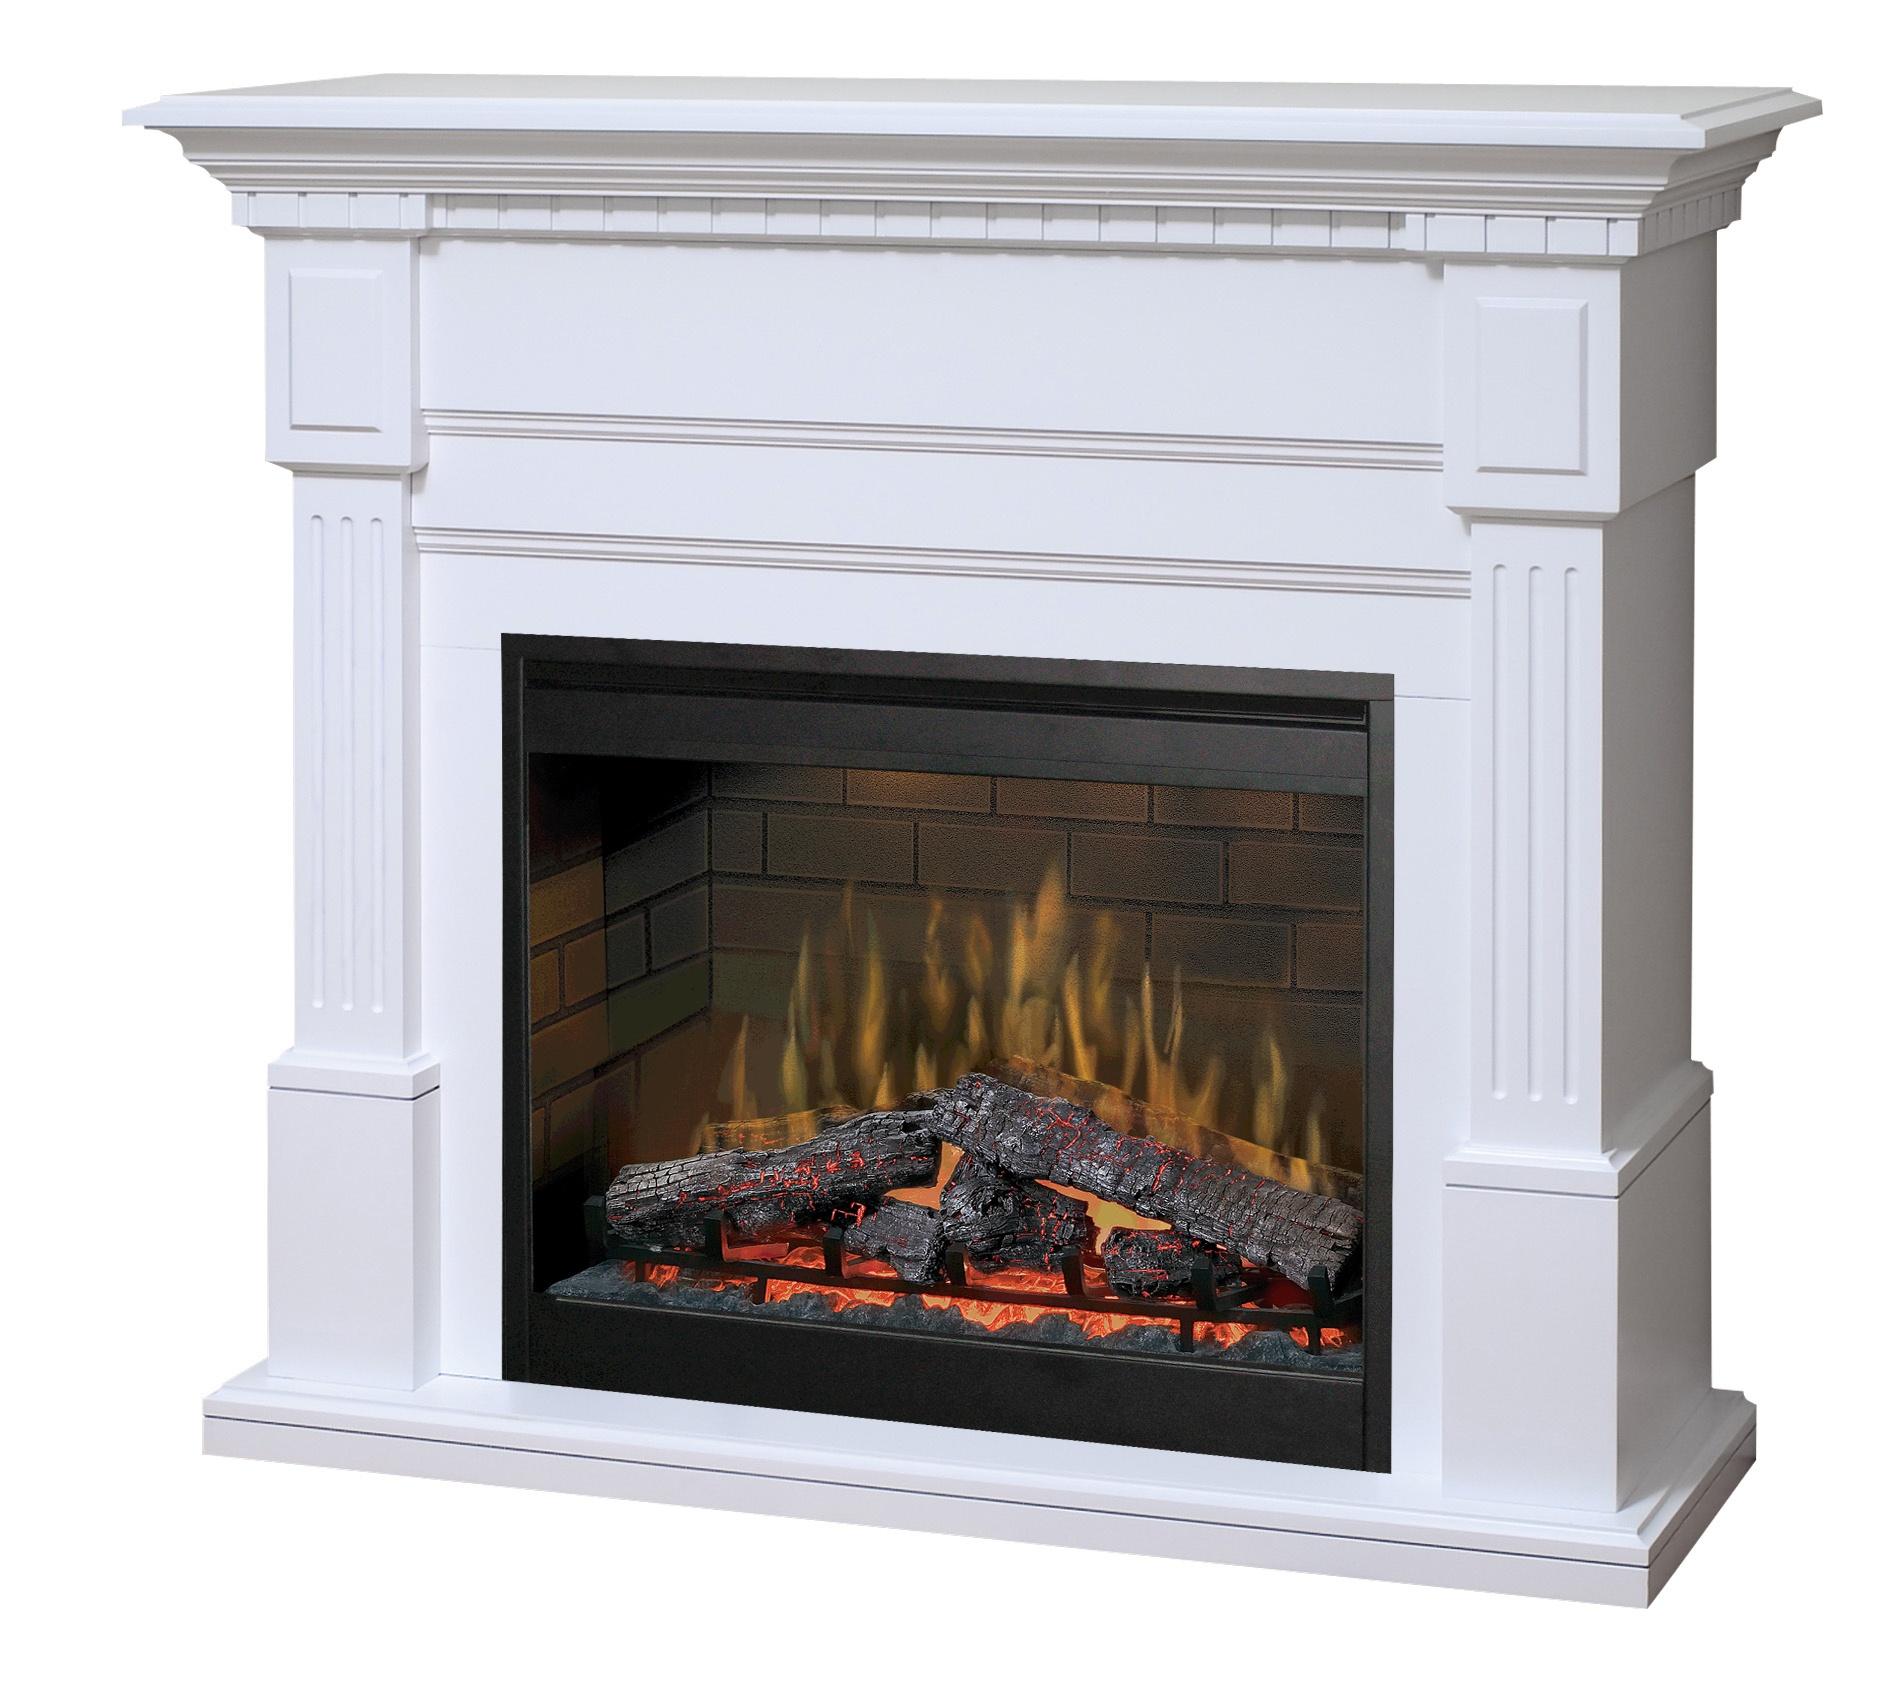 Dimplex Essex Gds30l3 1086w 30 Quot Electric Fireplace Wall